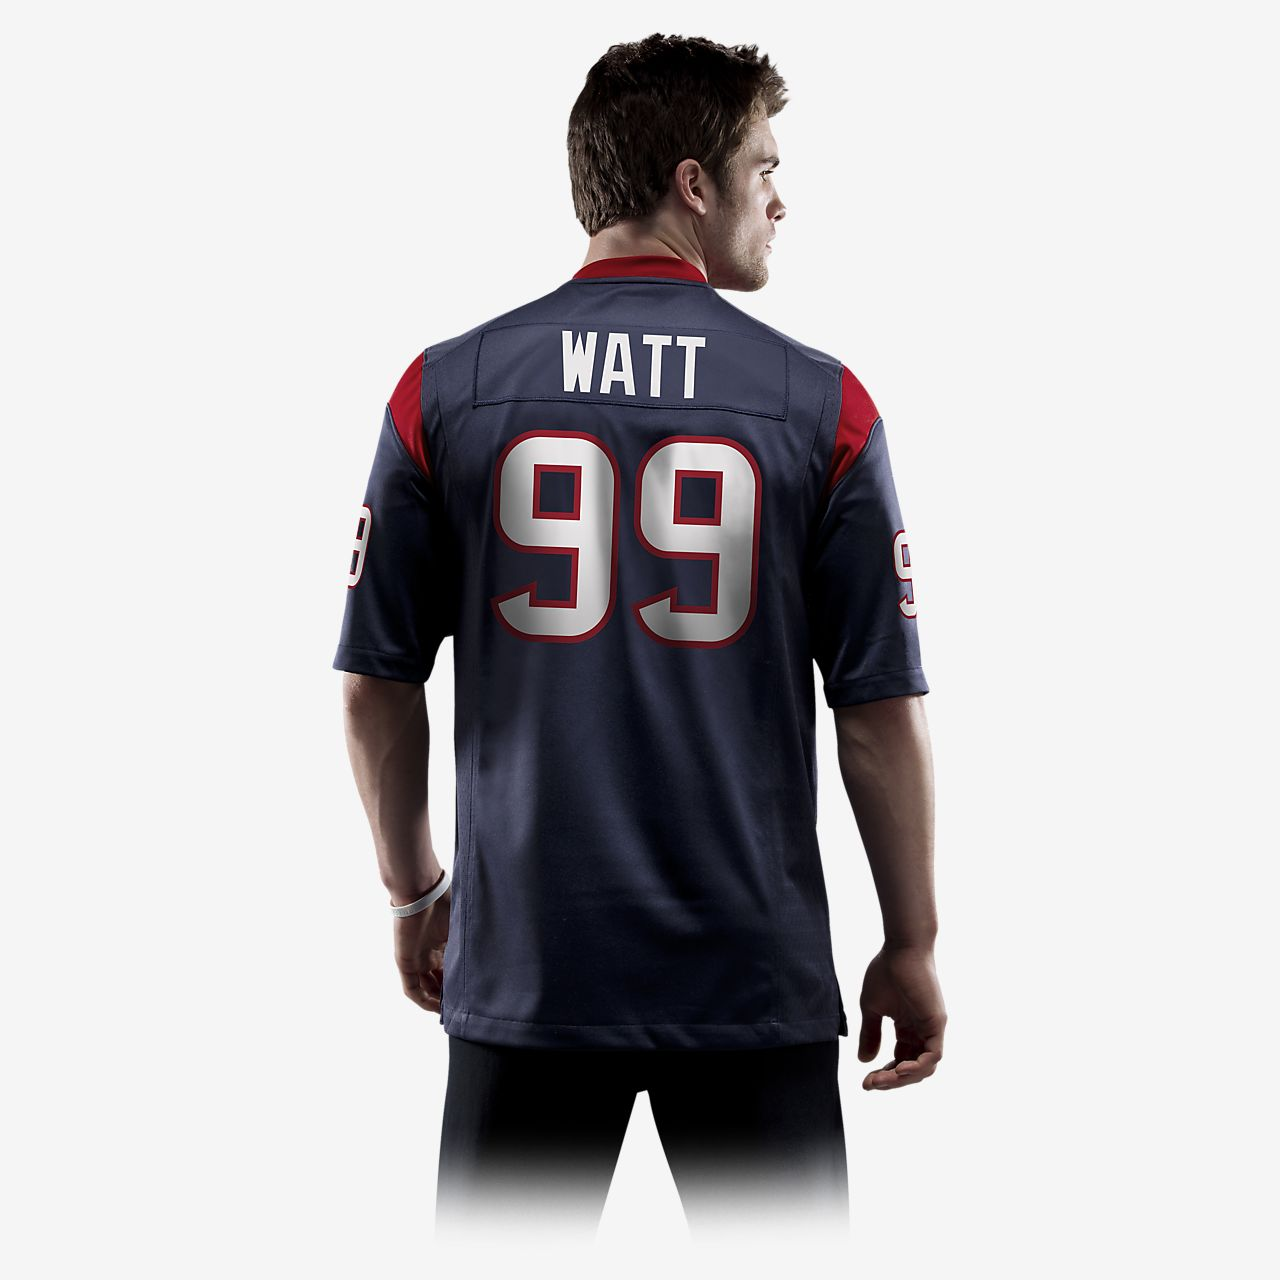 22a96927a8c ... NFL Houston Texans (J.J. Watt) Men s American Football Home Game Jersey